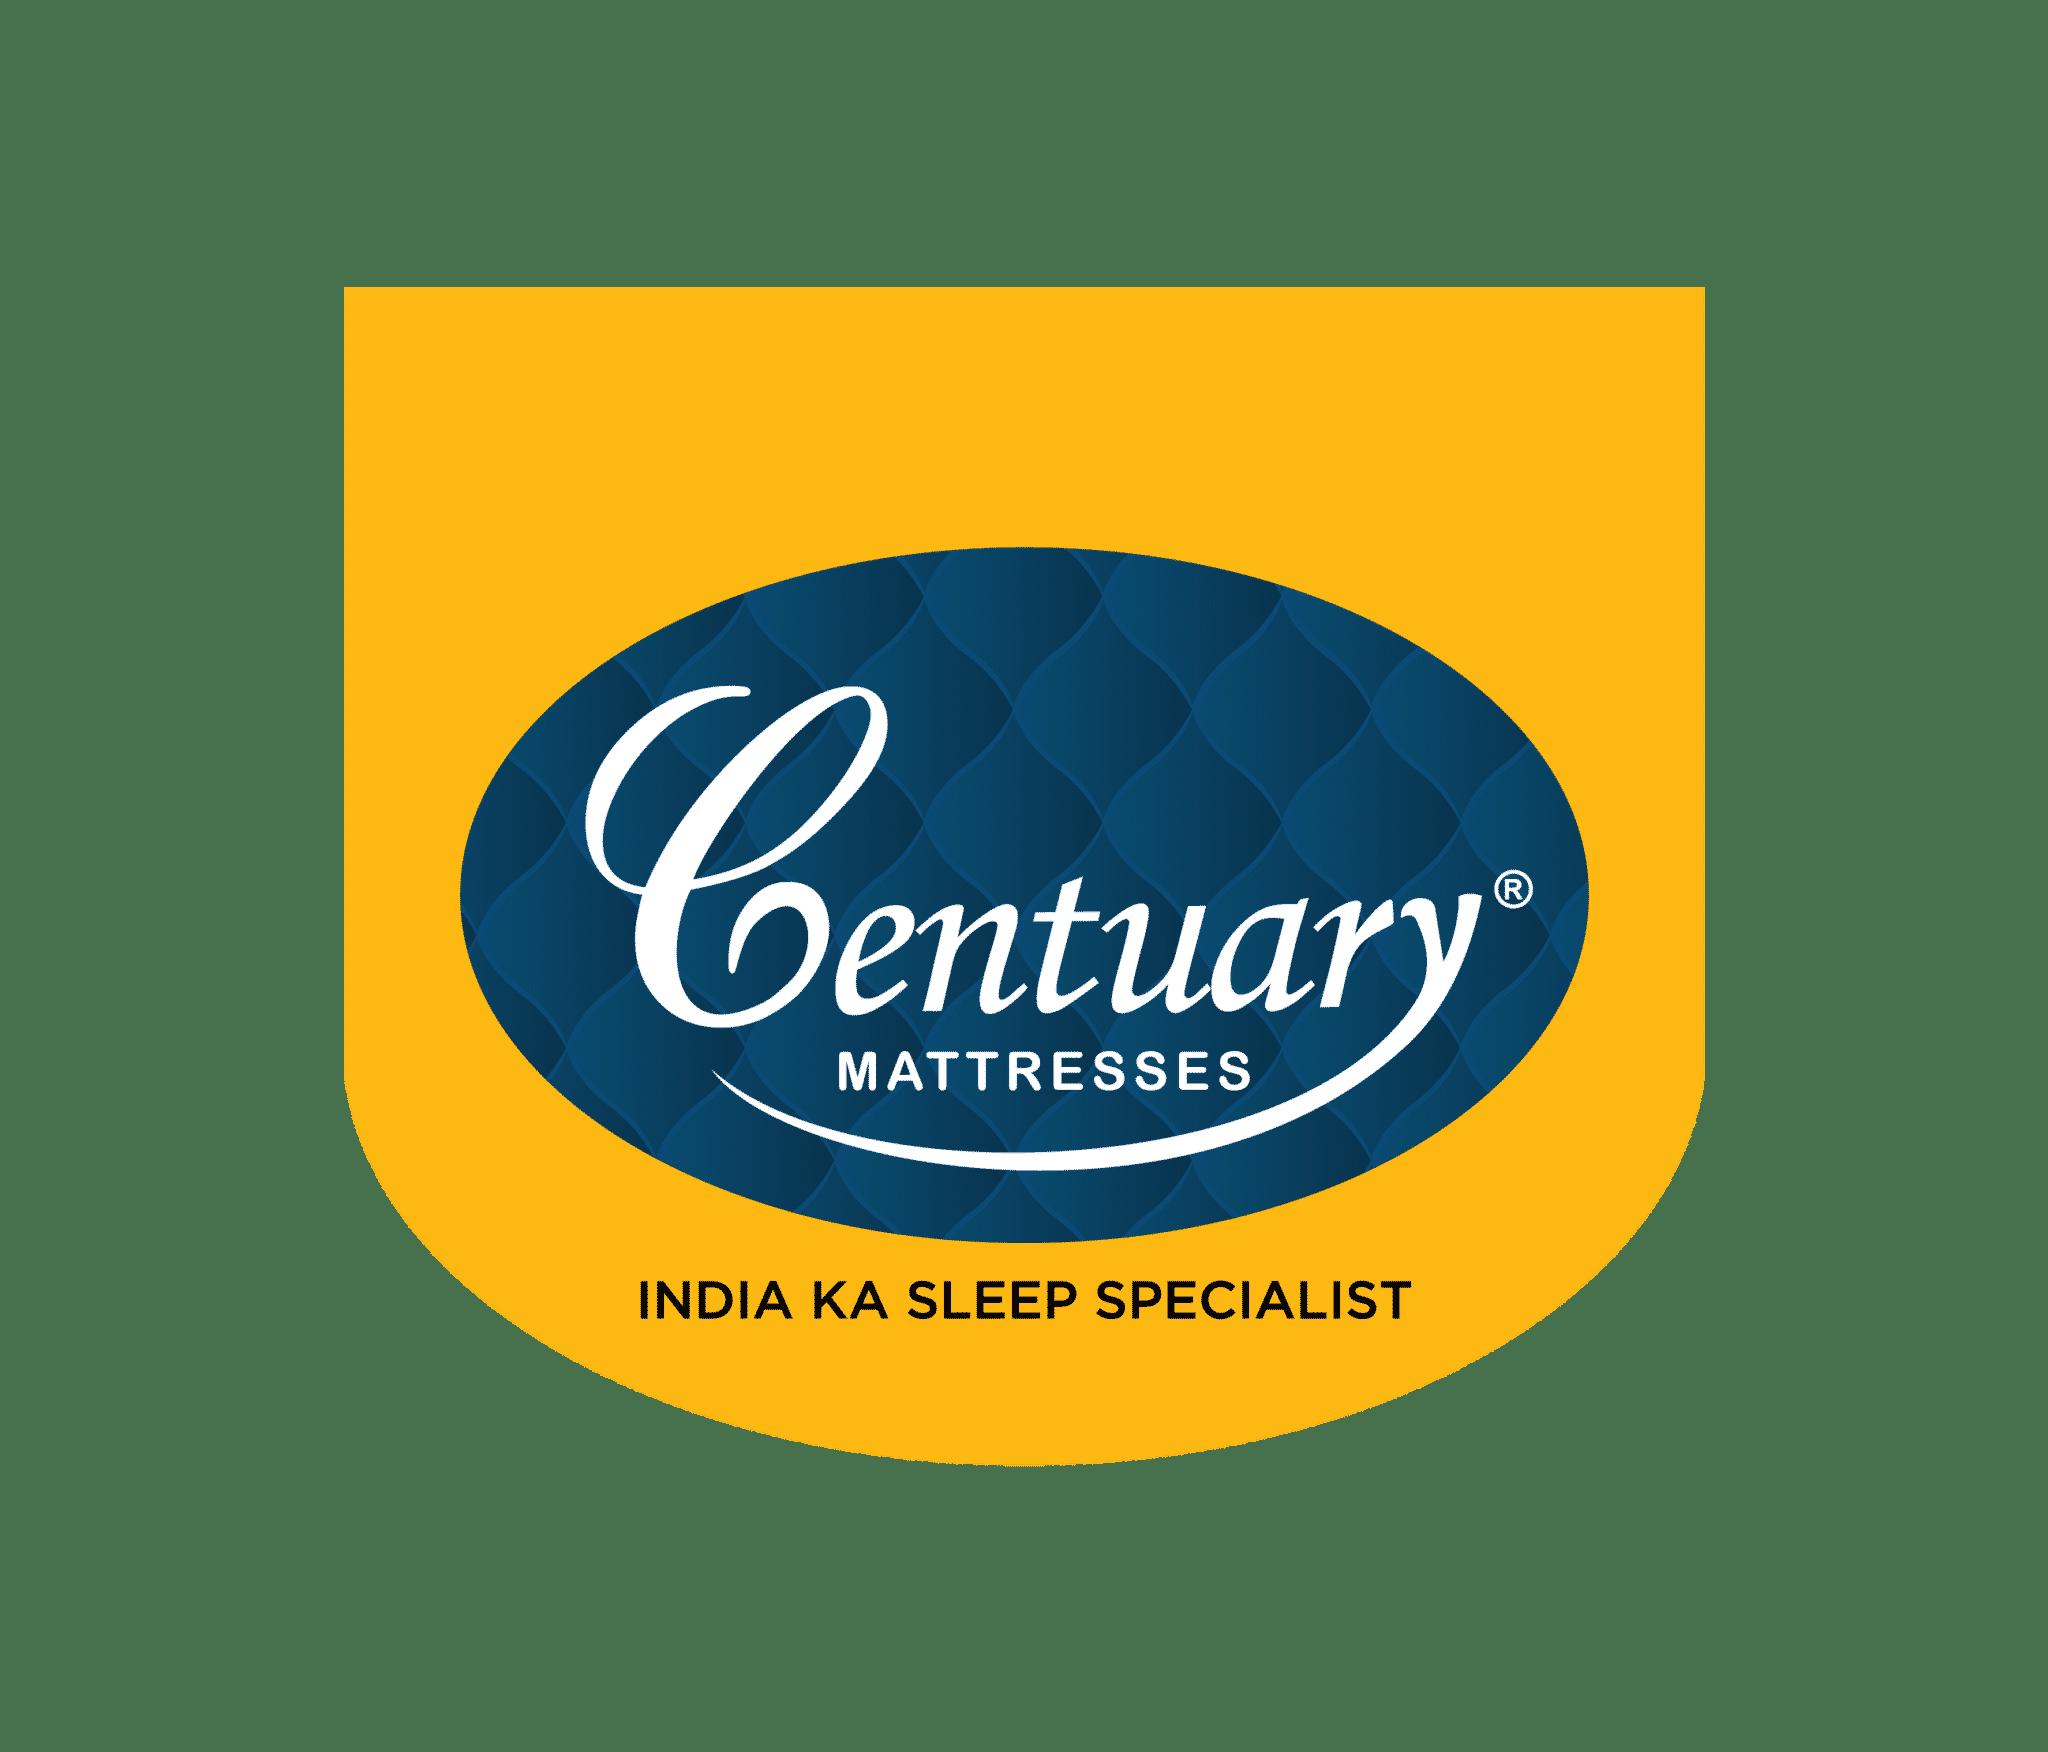 Buy Best Mattress Online India Leading Mattress Brand Centuary Mattresses